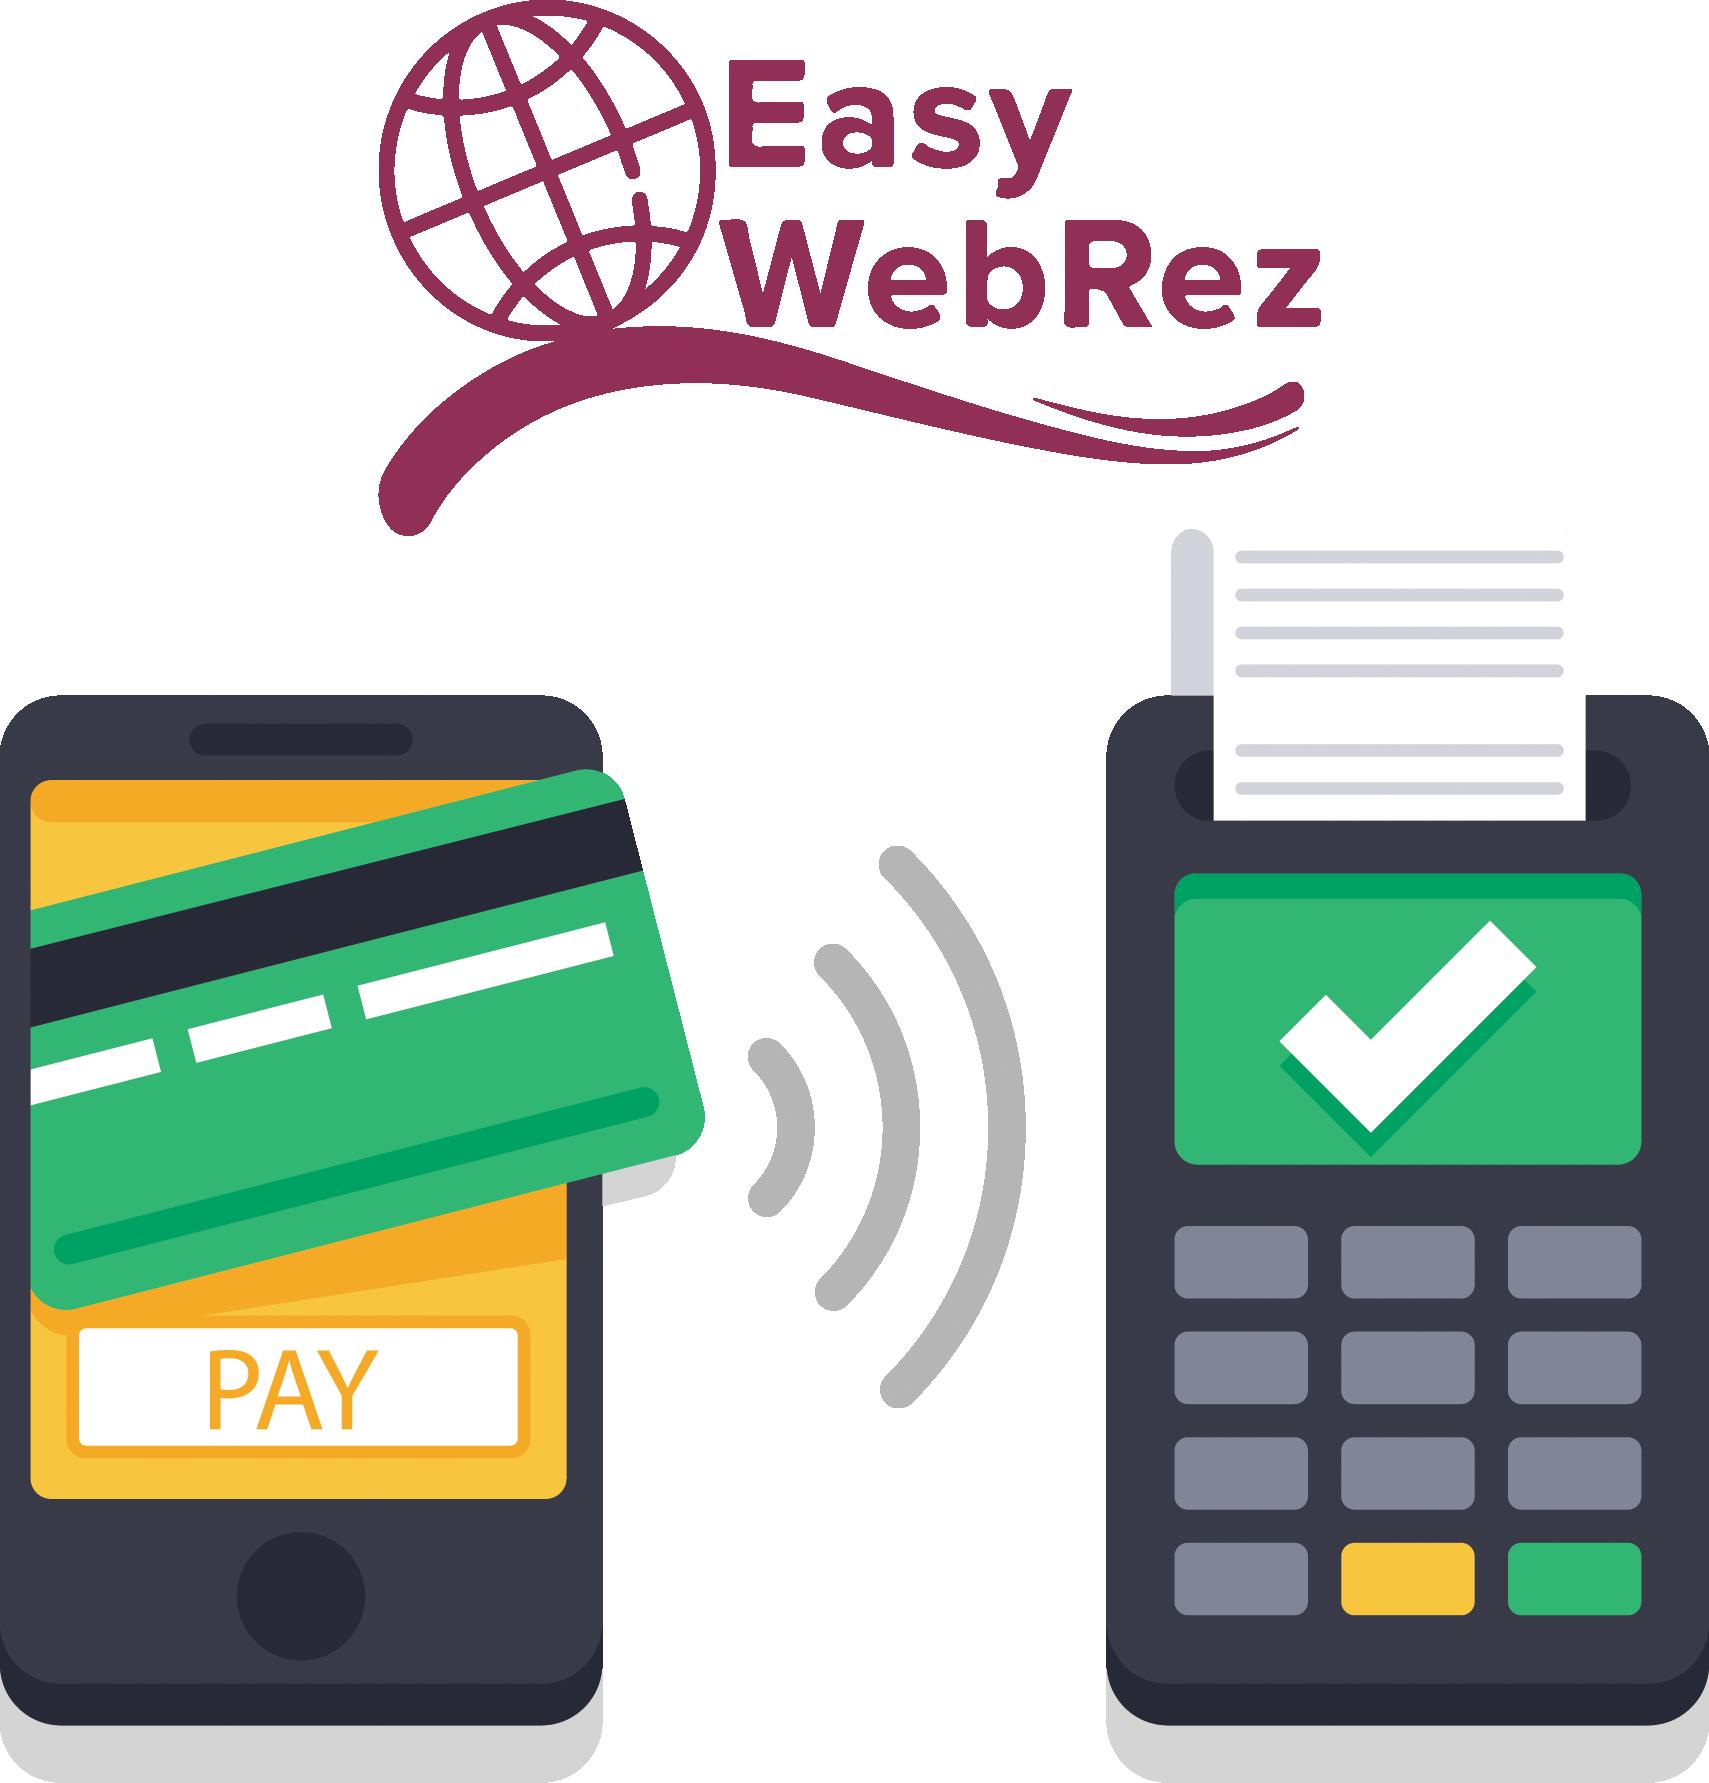 online-hotel-reservation-software-online-booking-payment-method